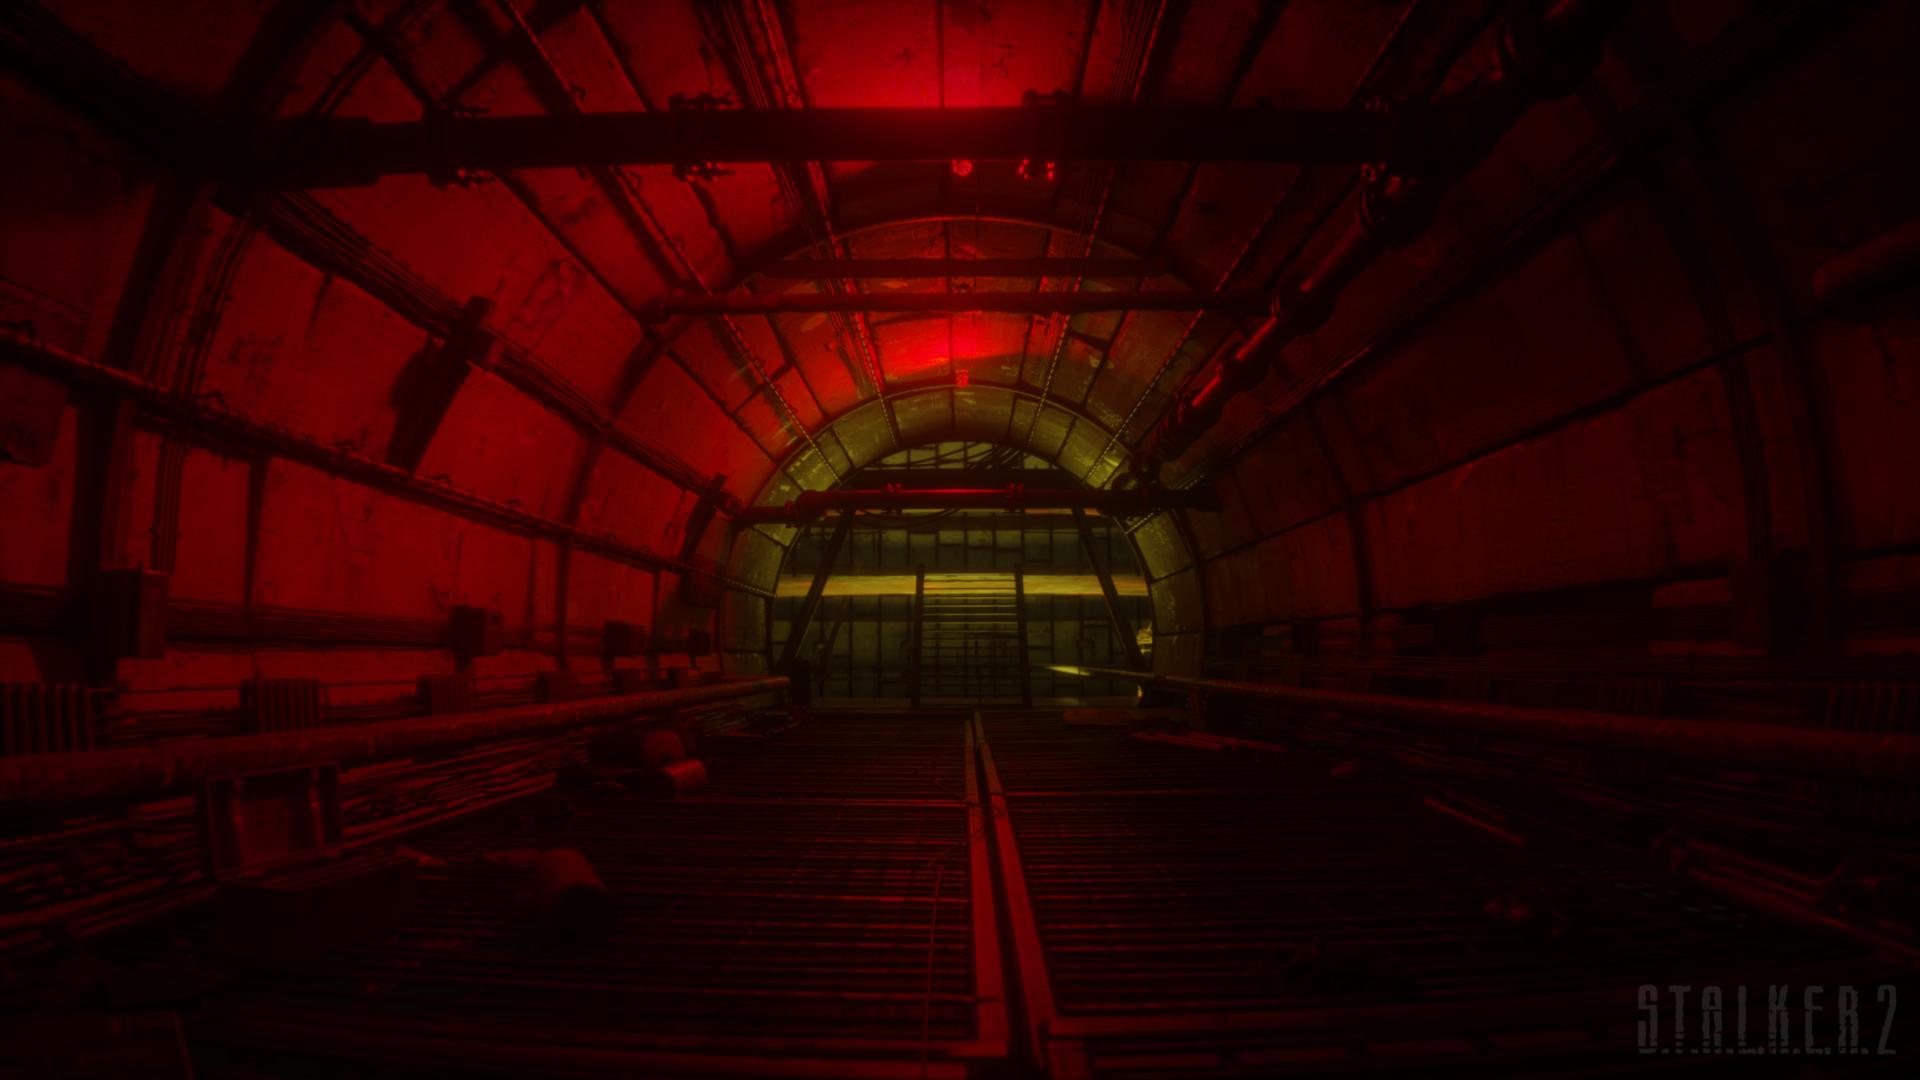 S.T.A.L.K.E.R 2 Underground Bunker